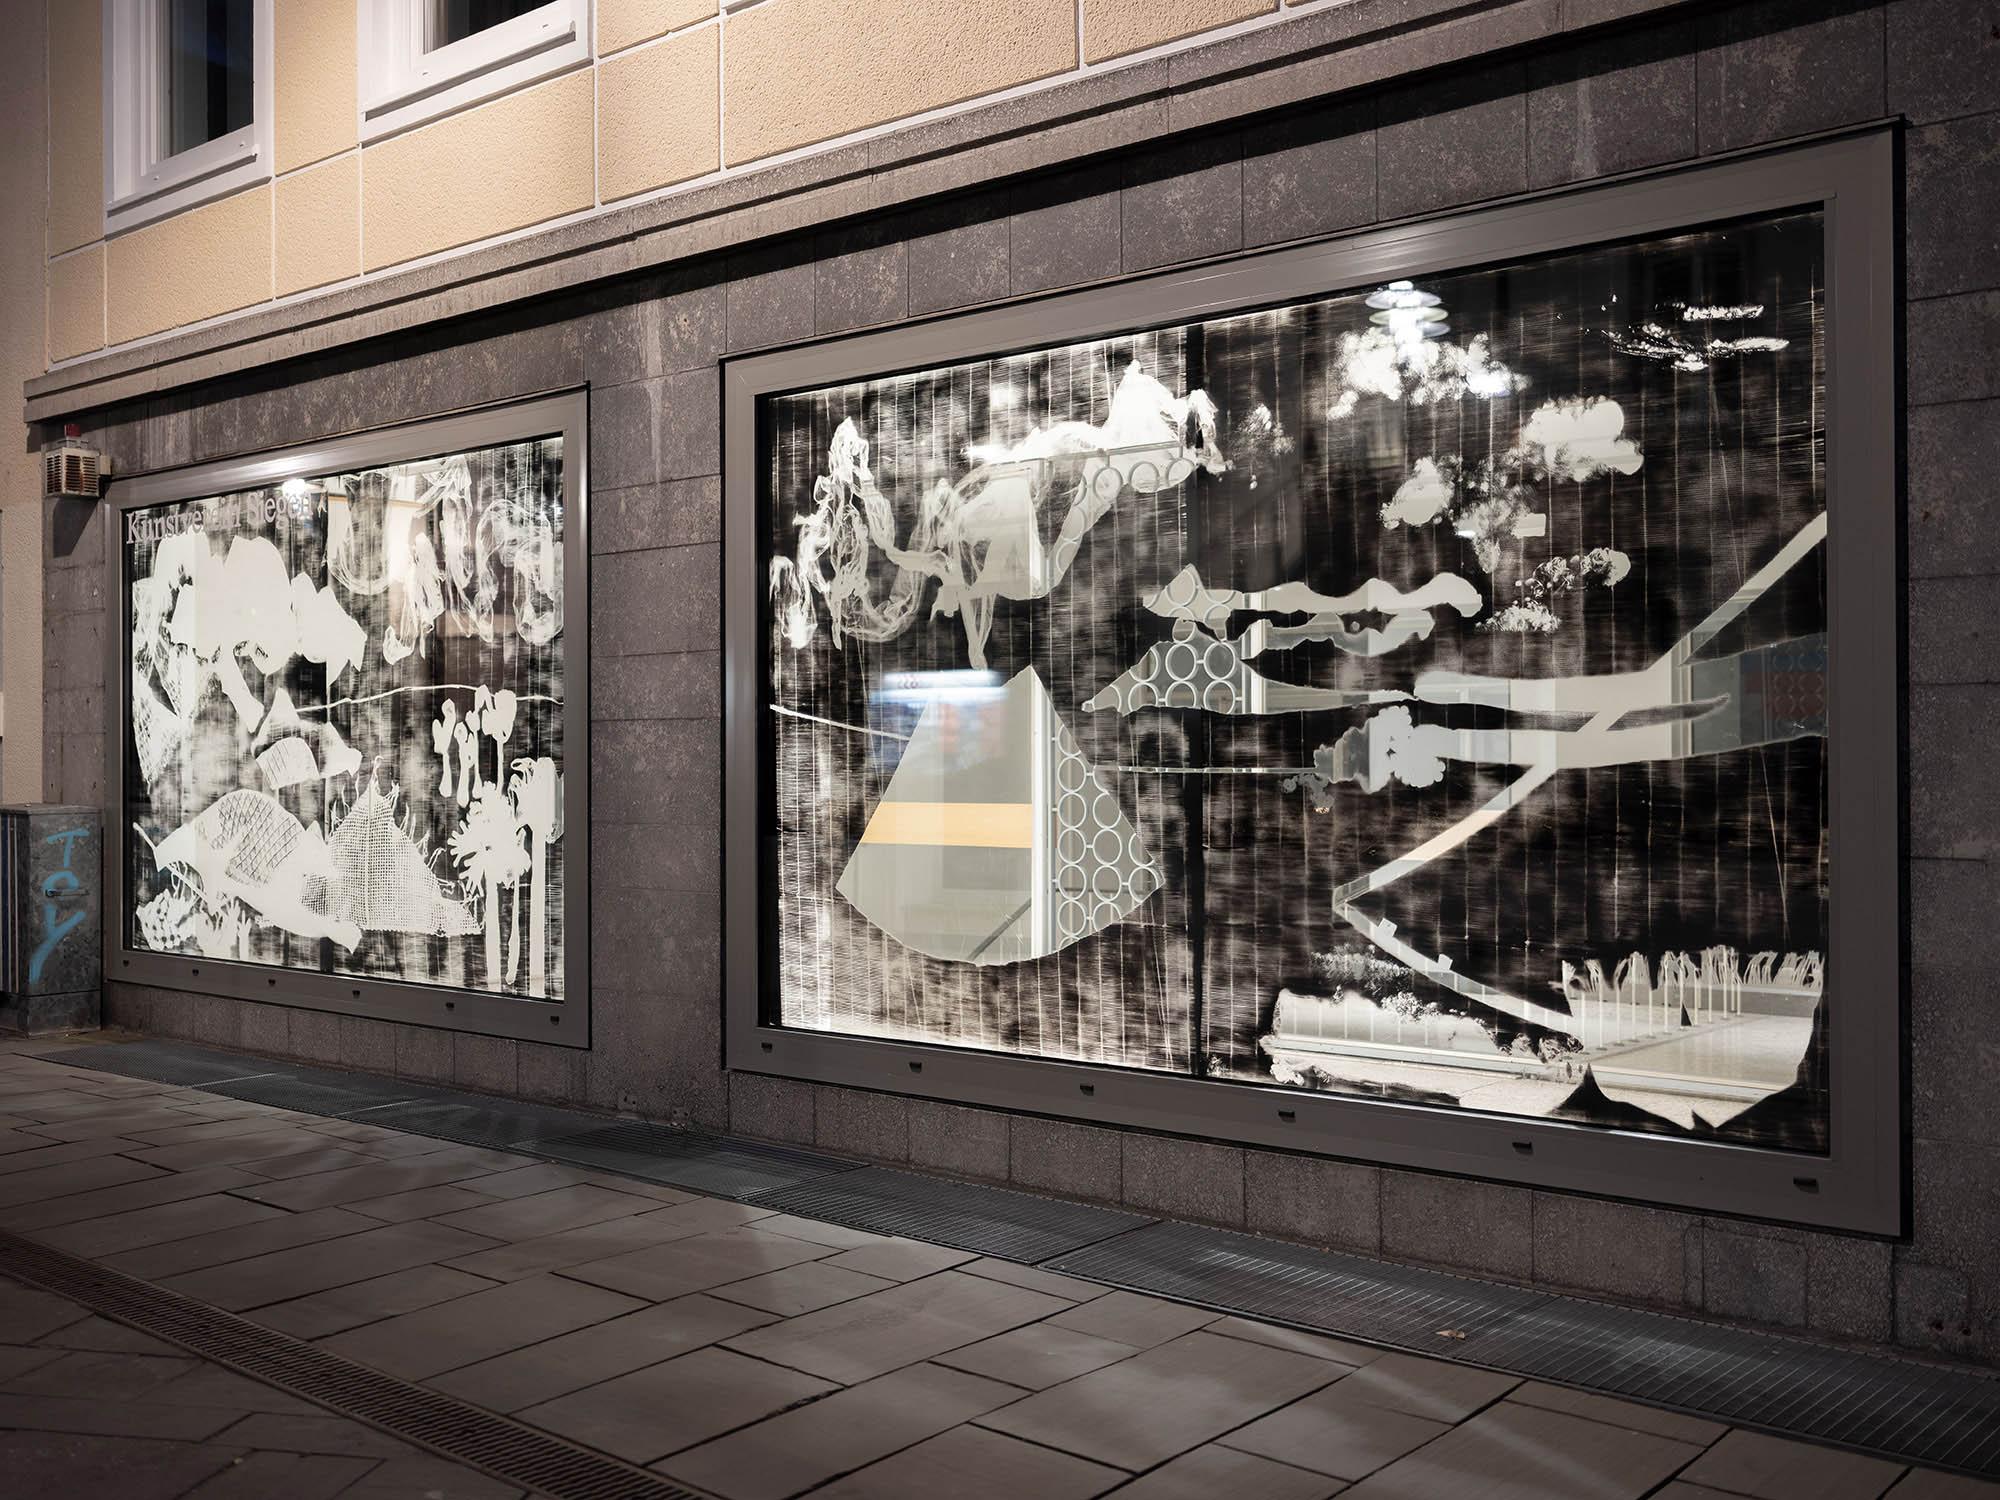 kunstverein siegen, munchies art club, online viewing room, eva berendes, alexandra leykauf, curated by jennifer cierlitza, germany, contemporary art